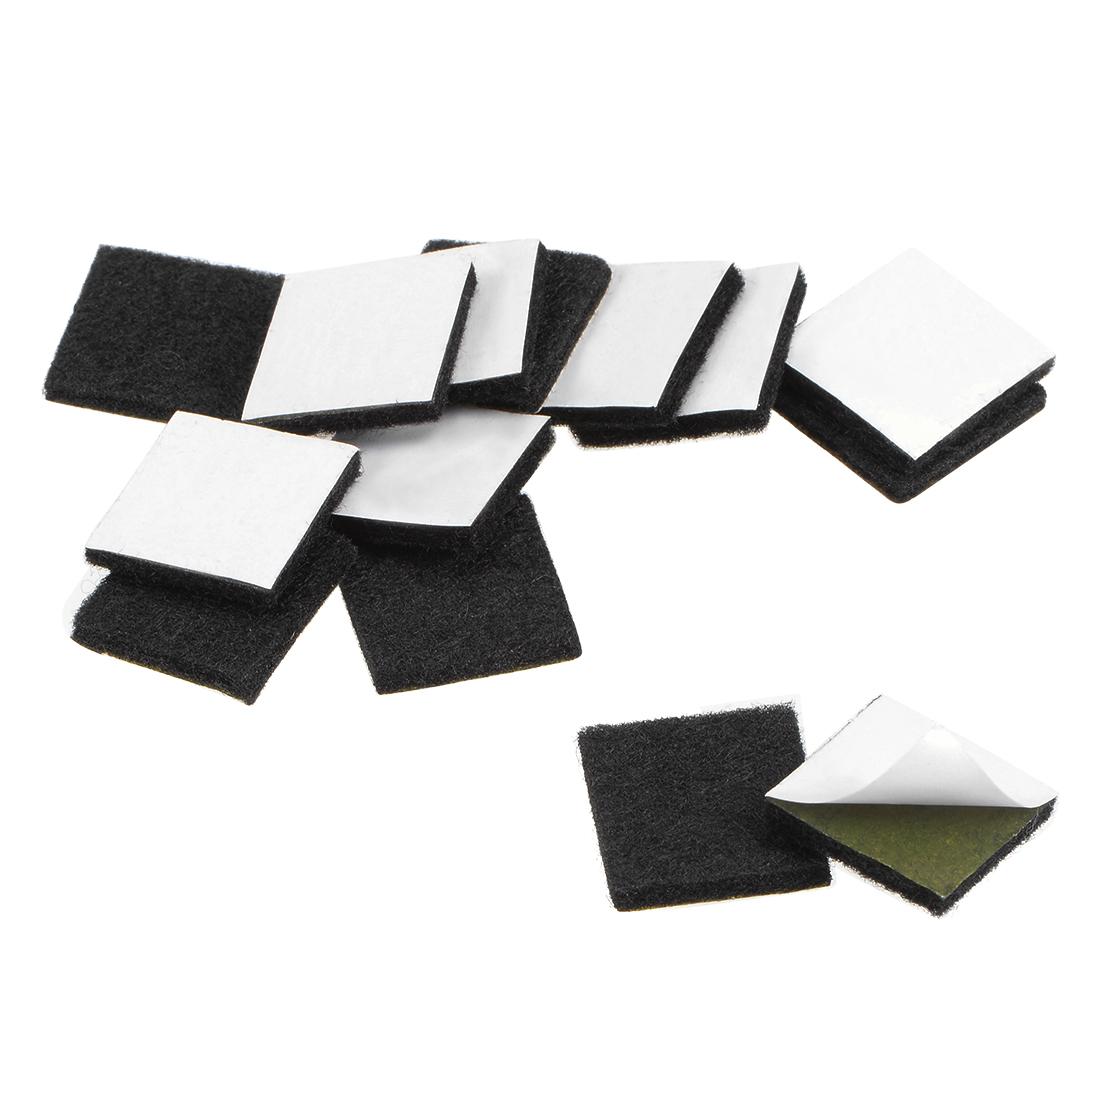 Furniture Pads Adhesive Felt Pads 20mm x 20mm Square 3mm Thick Black 48Pcs